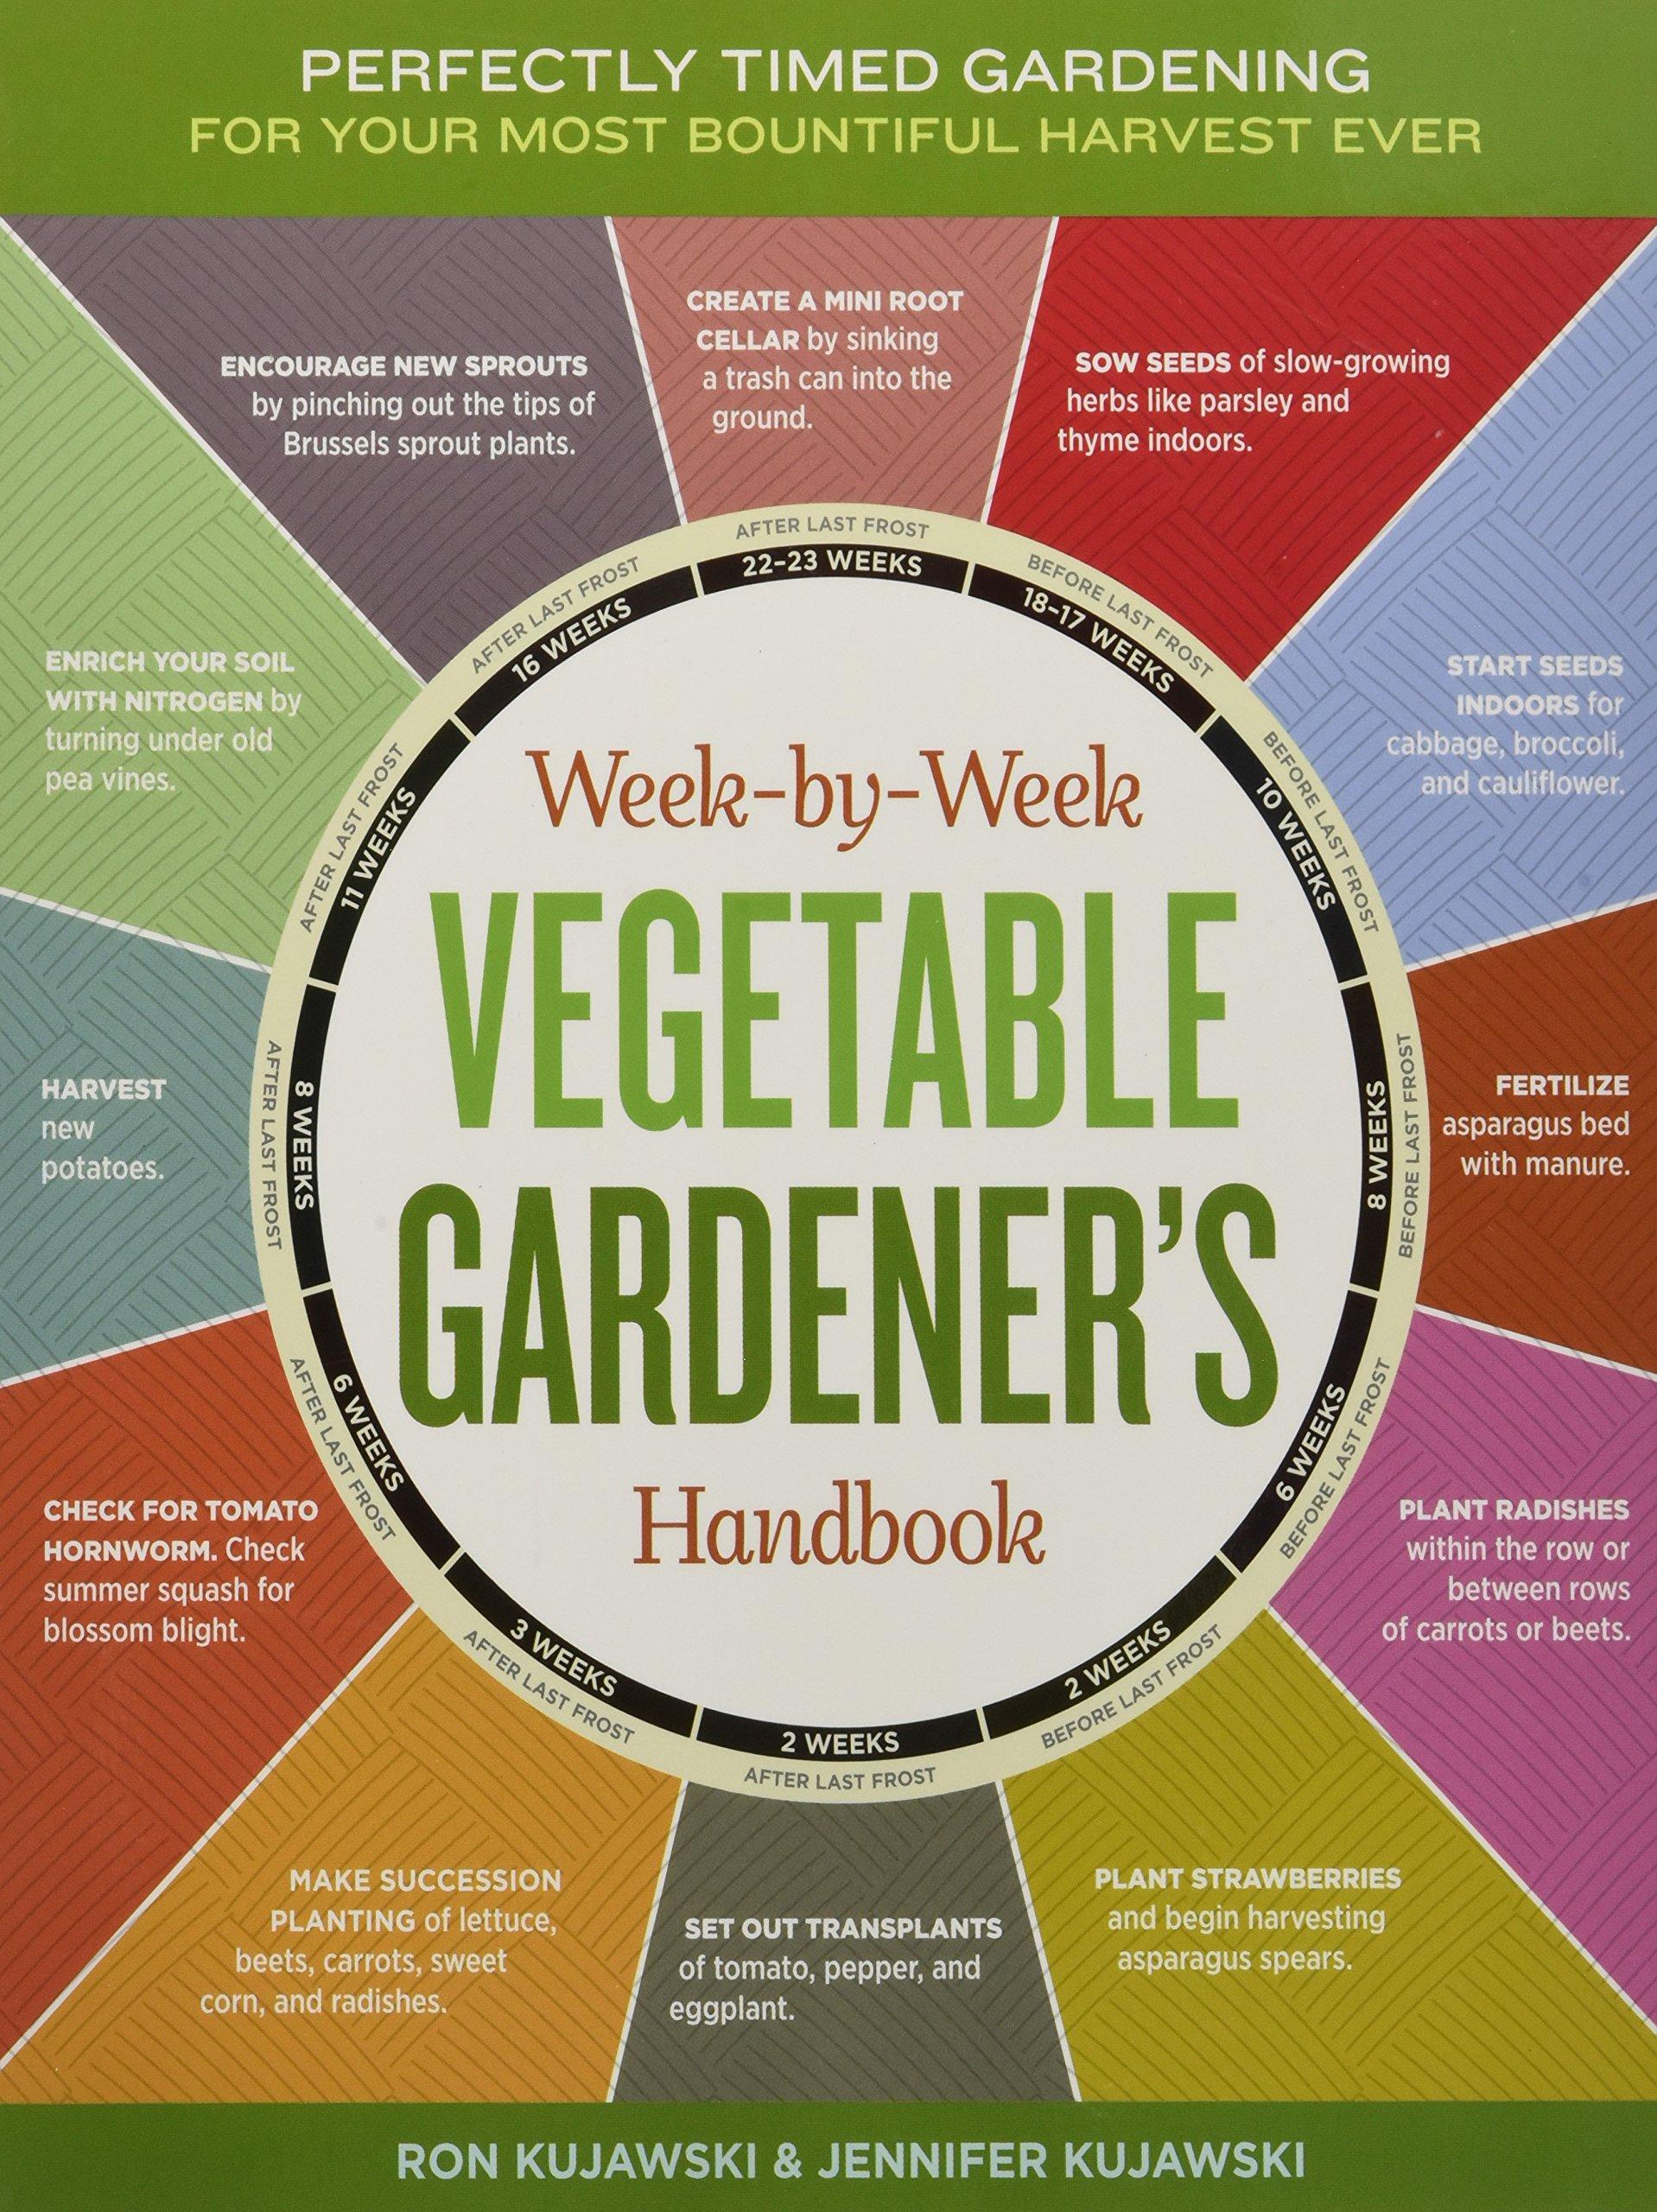 The Week-by-Week Vegetable Gardener's Handbook: Make the Most of Your Growing Season by Storey Publishing, LLC